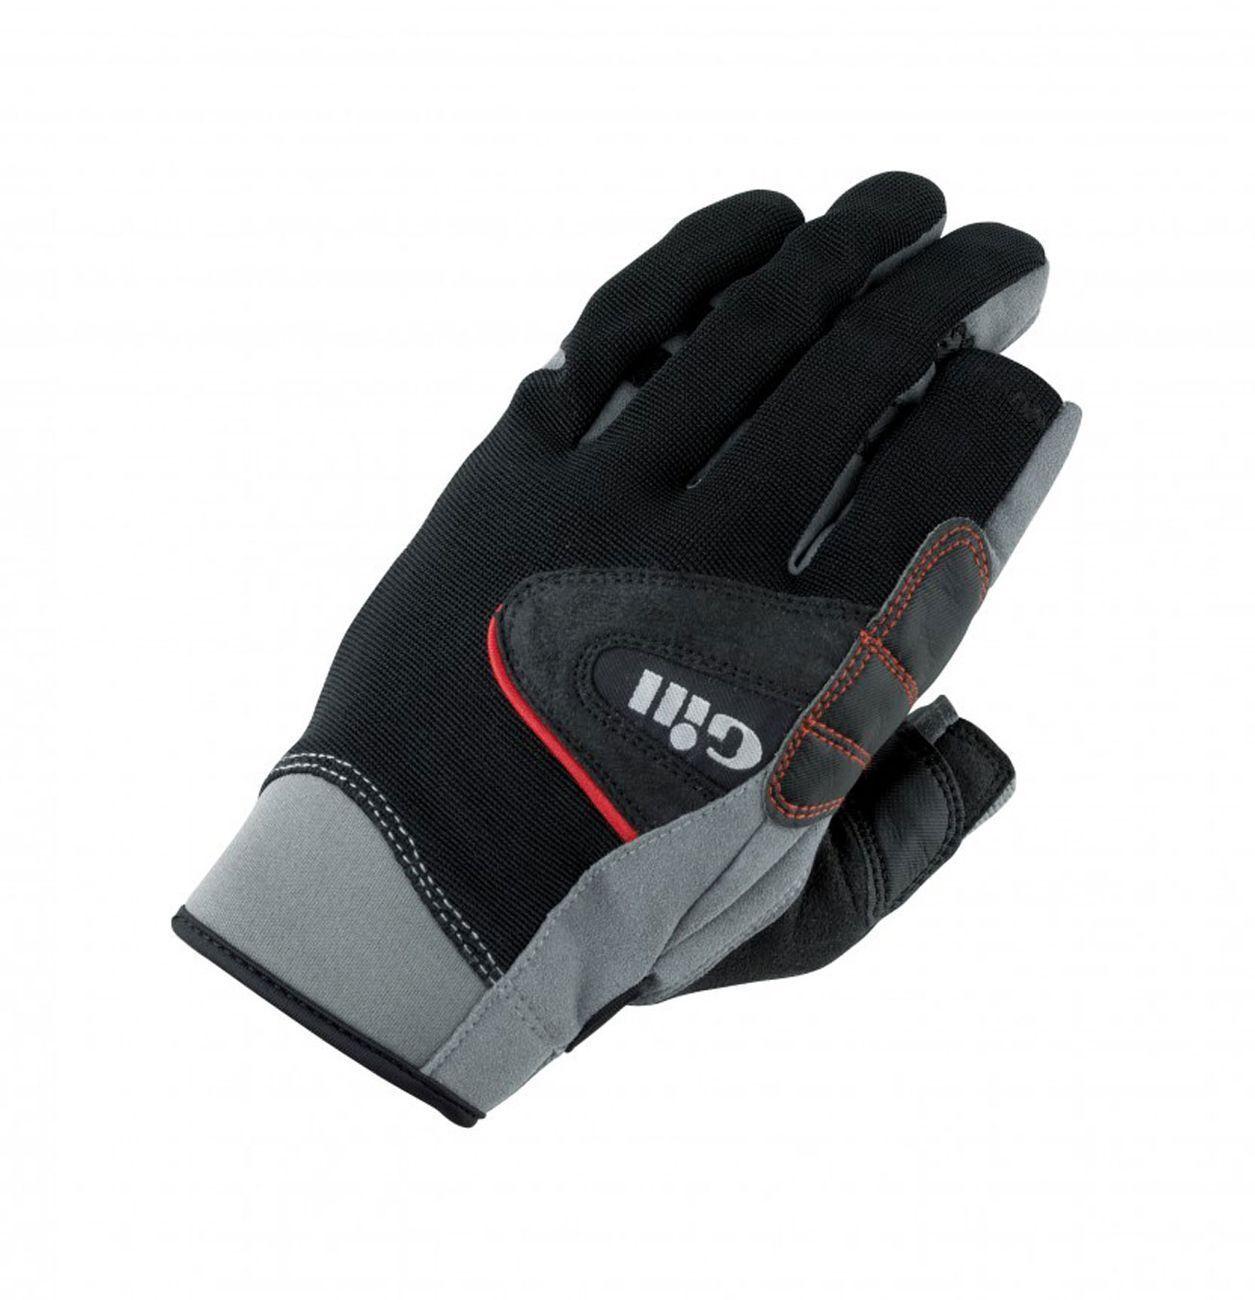 Gill hochwertige Segelhandschuhe Championship 2-Finger-frei Unisex starker Grip